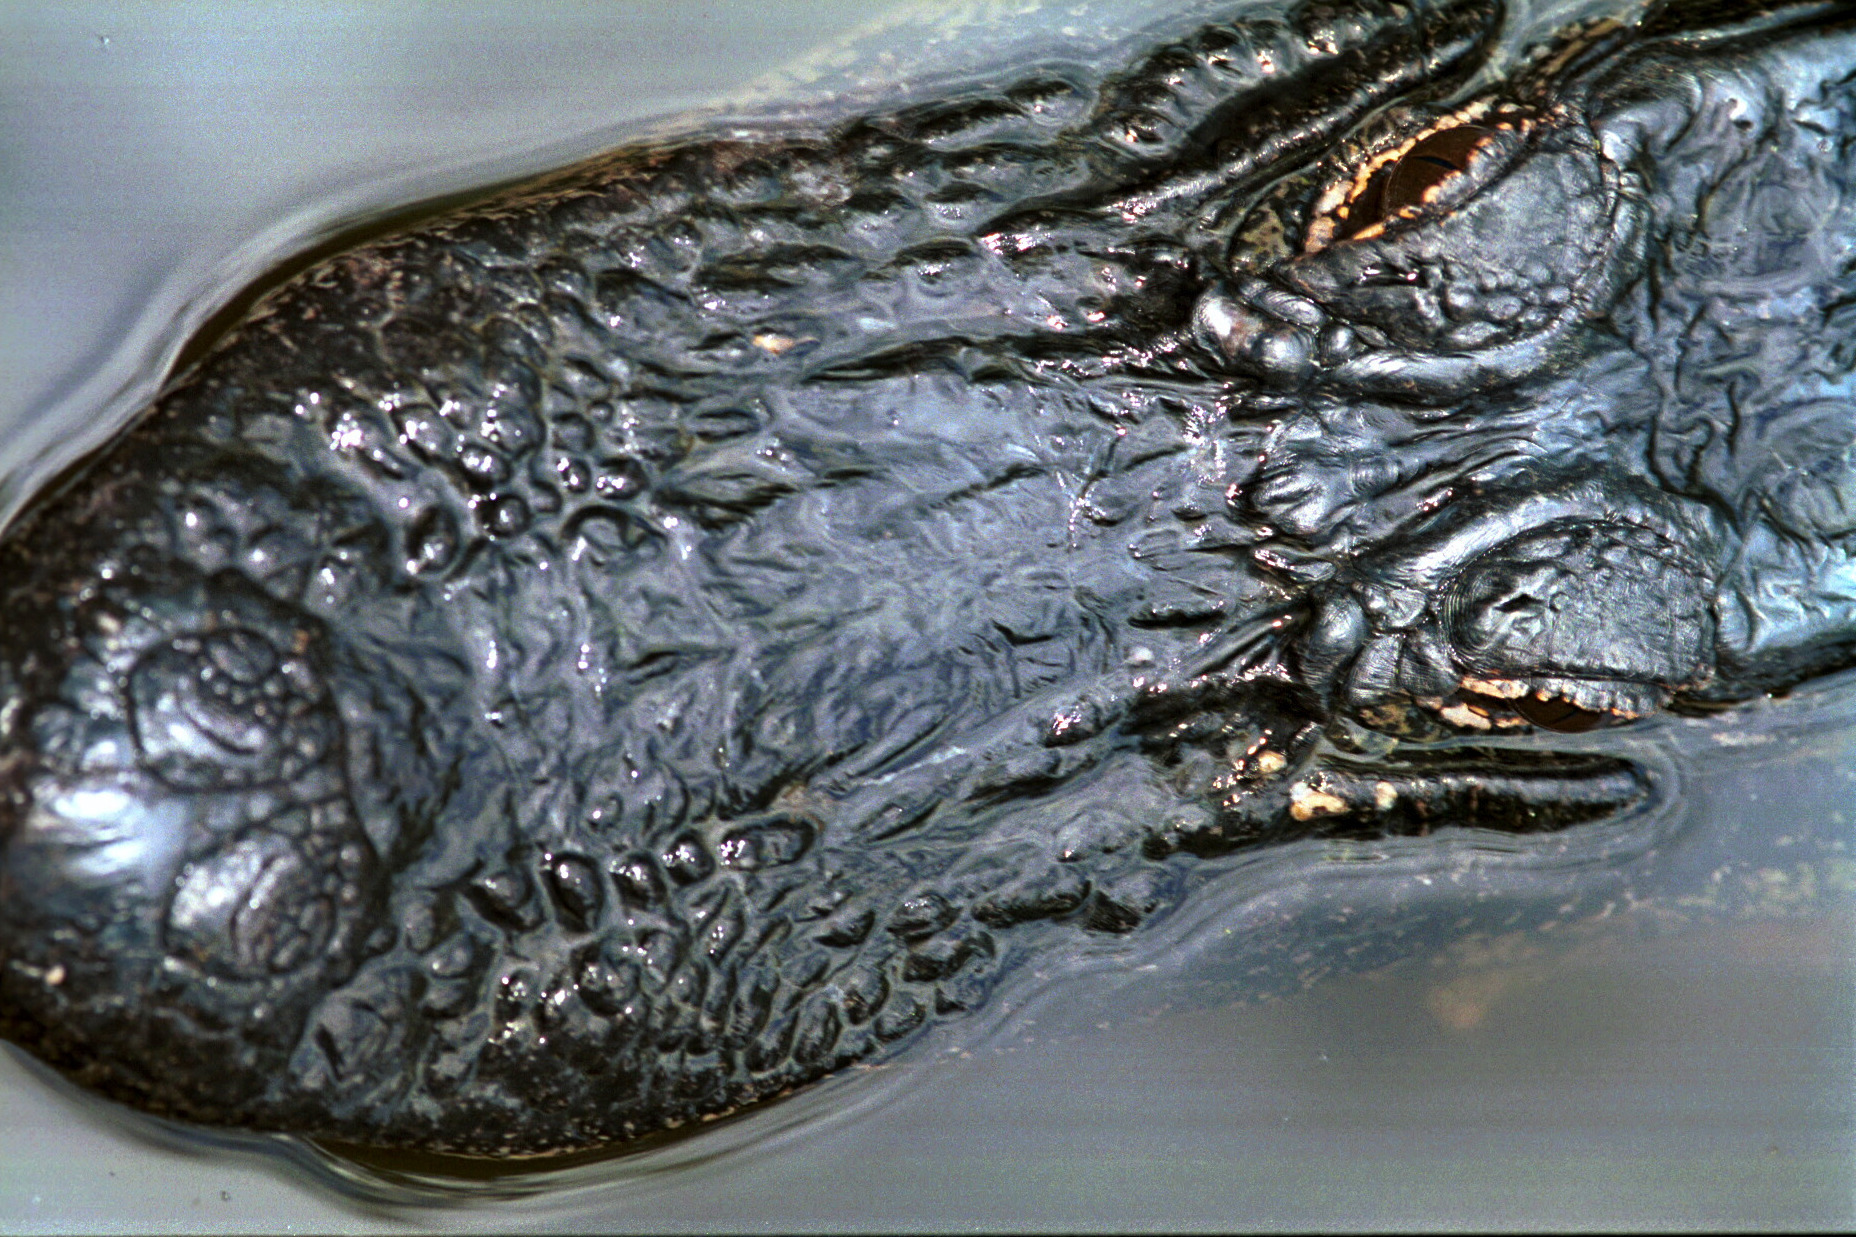 Alligator Louisiane